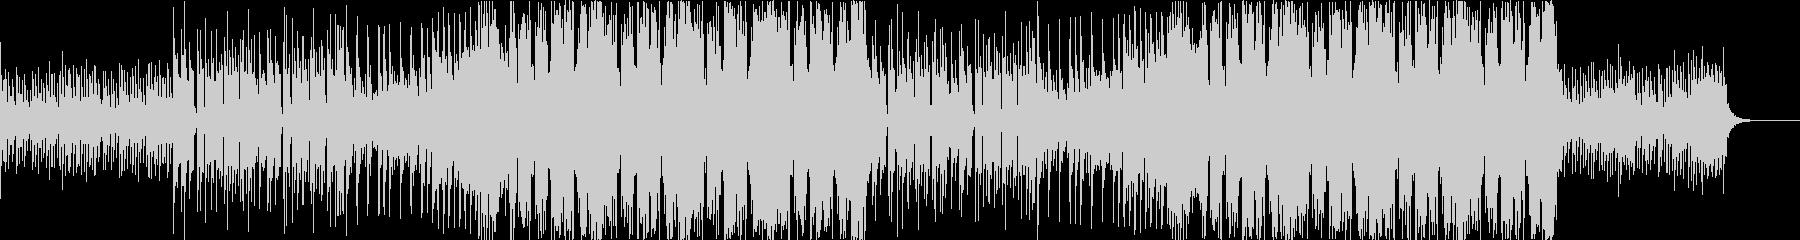 EDM風近代的Future Bassの未再生の波形